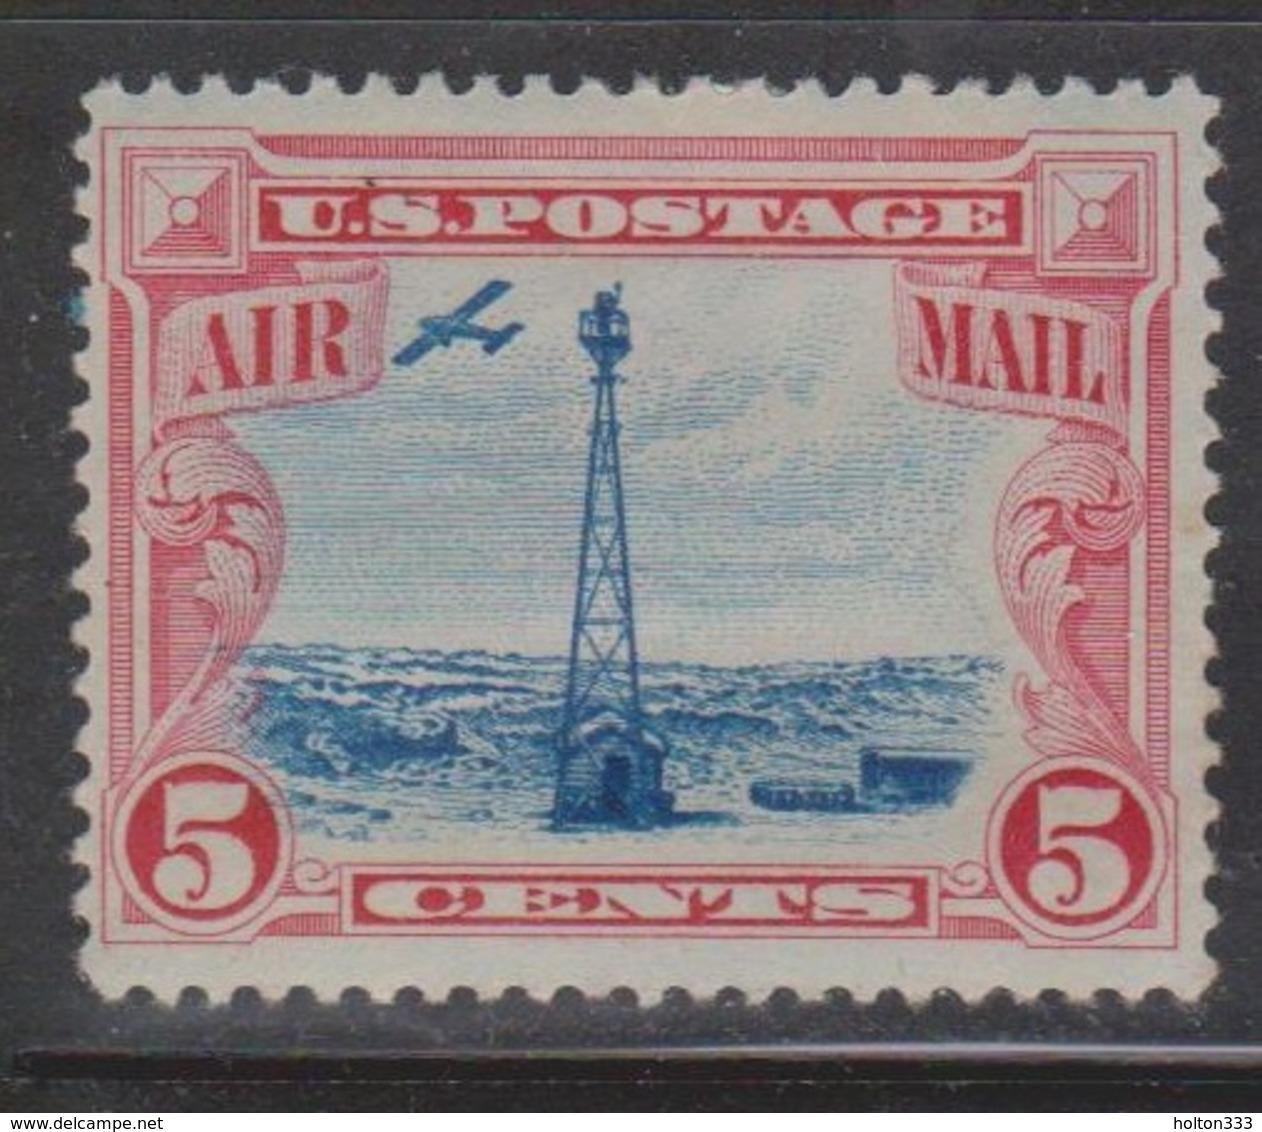 UNITED STATES Scott # C11 MH - Airmail - Air Mail